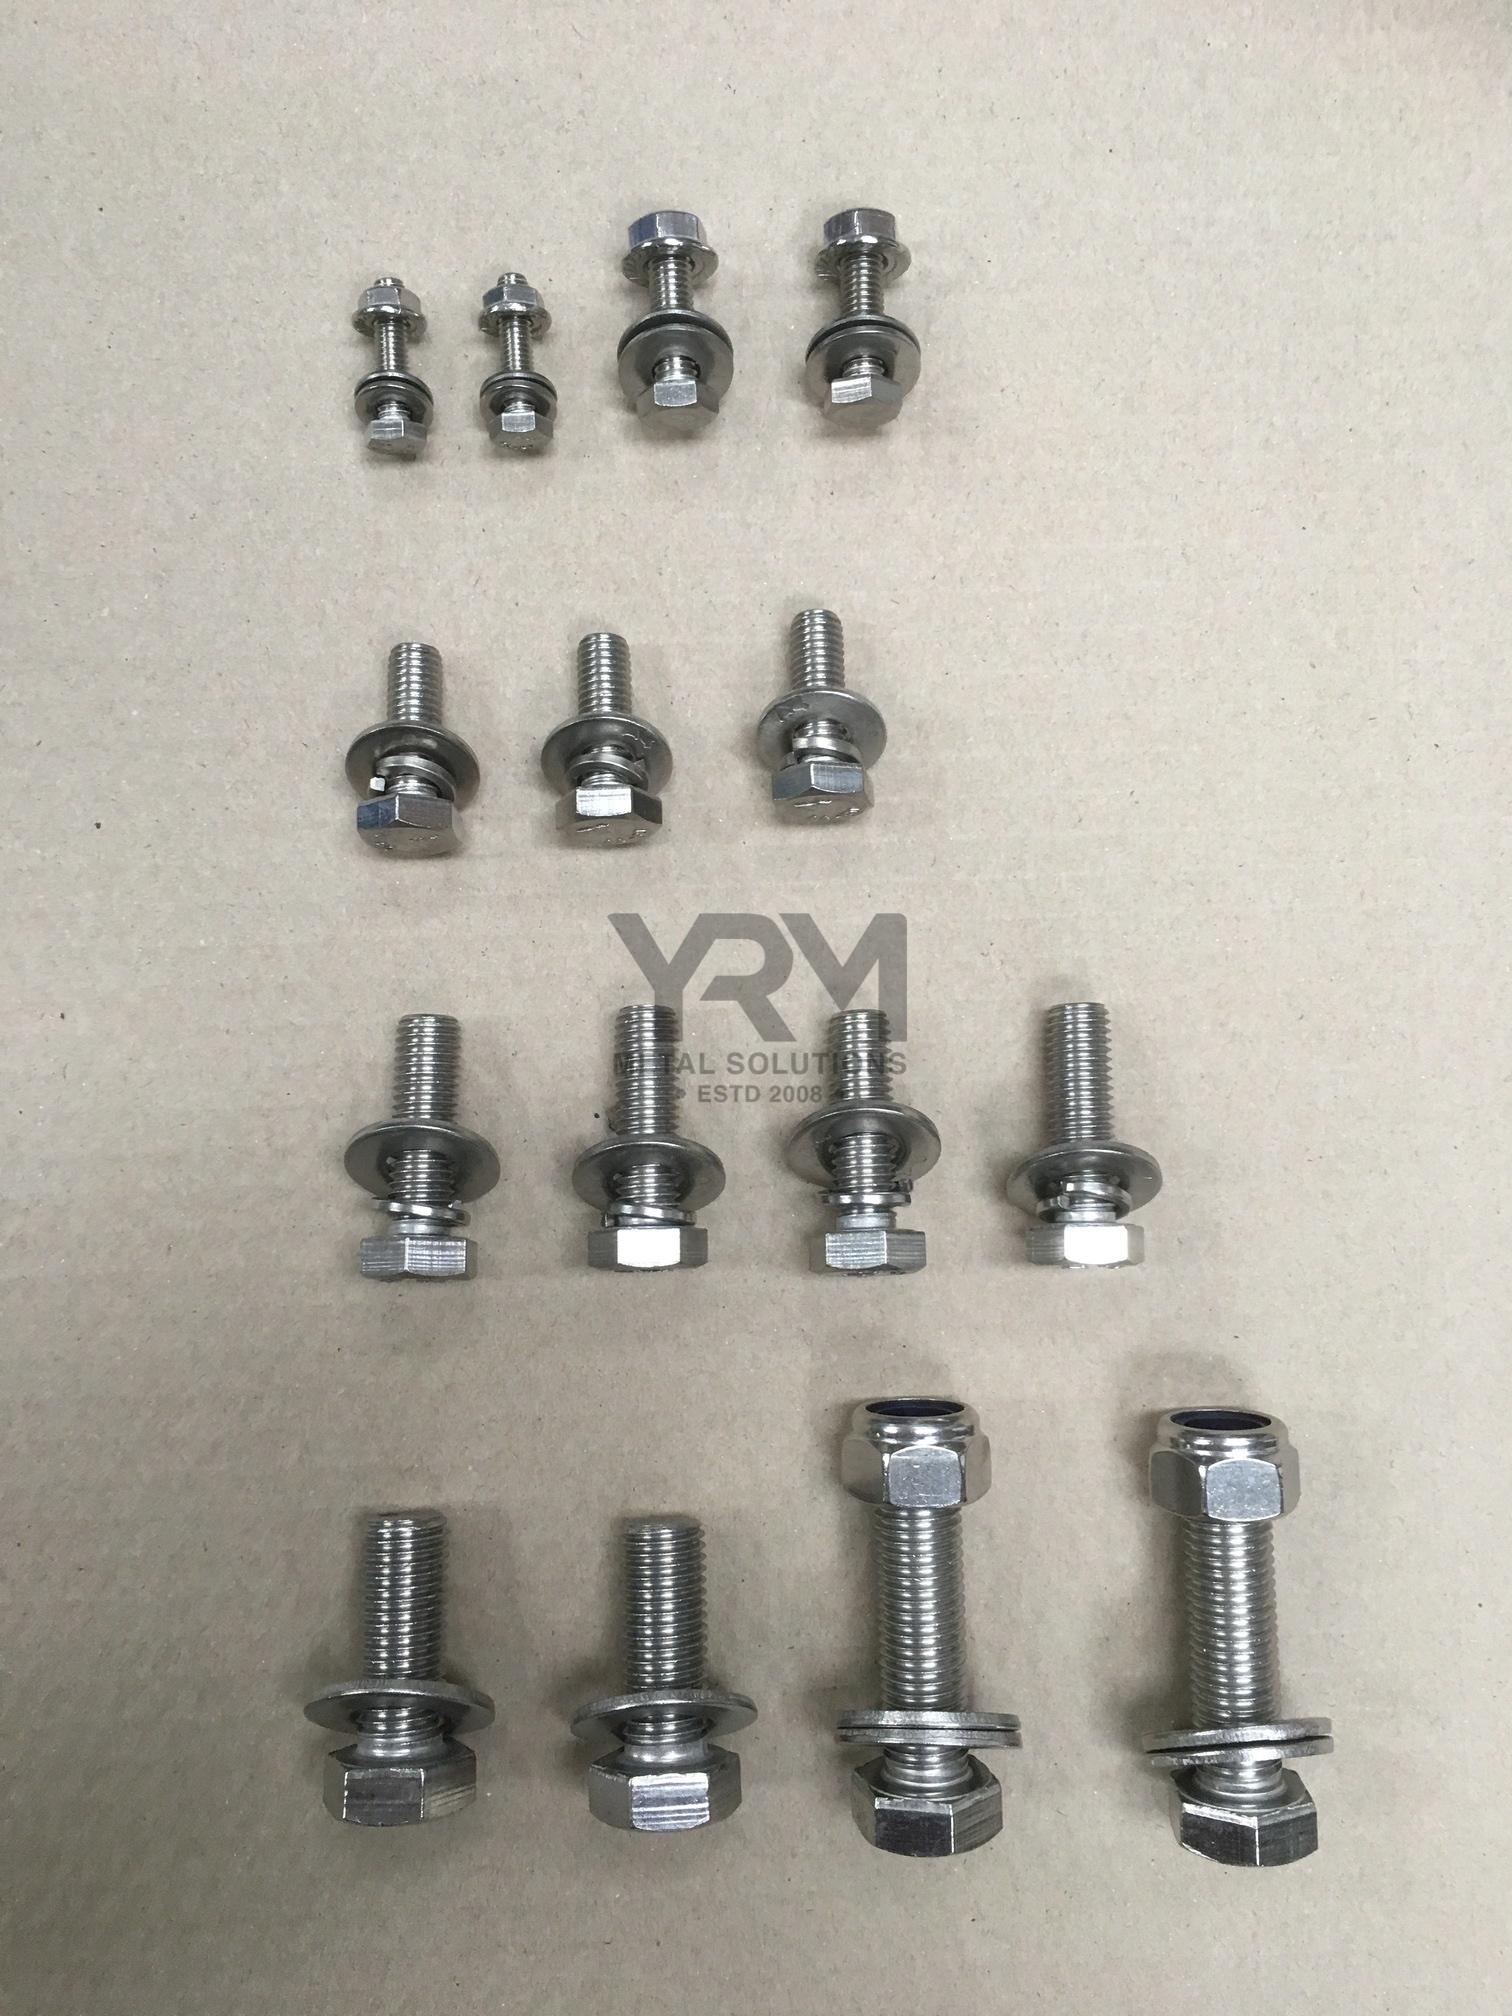 AUDI A5 8F 2.7D Pollen Cabin Filter 09 to 12 CGKA B/&B 8K0819439A 8K0819439B